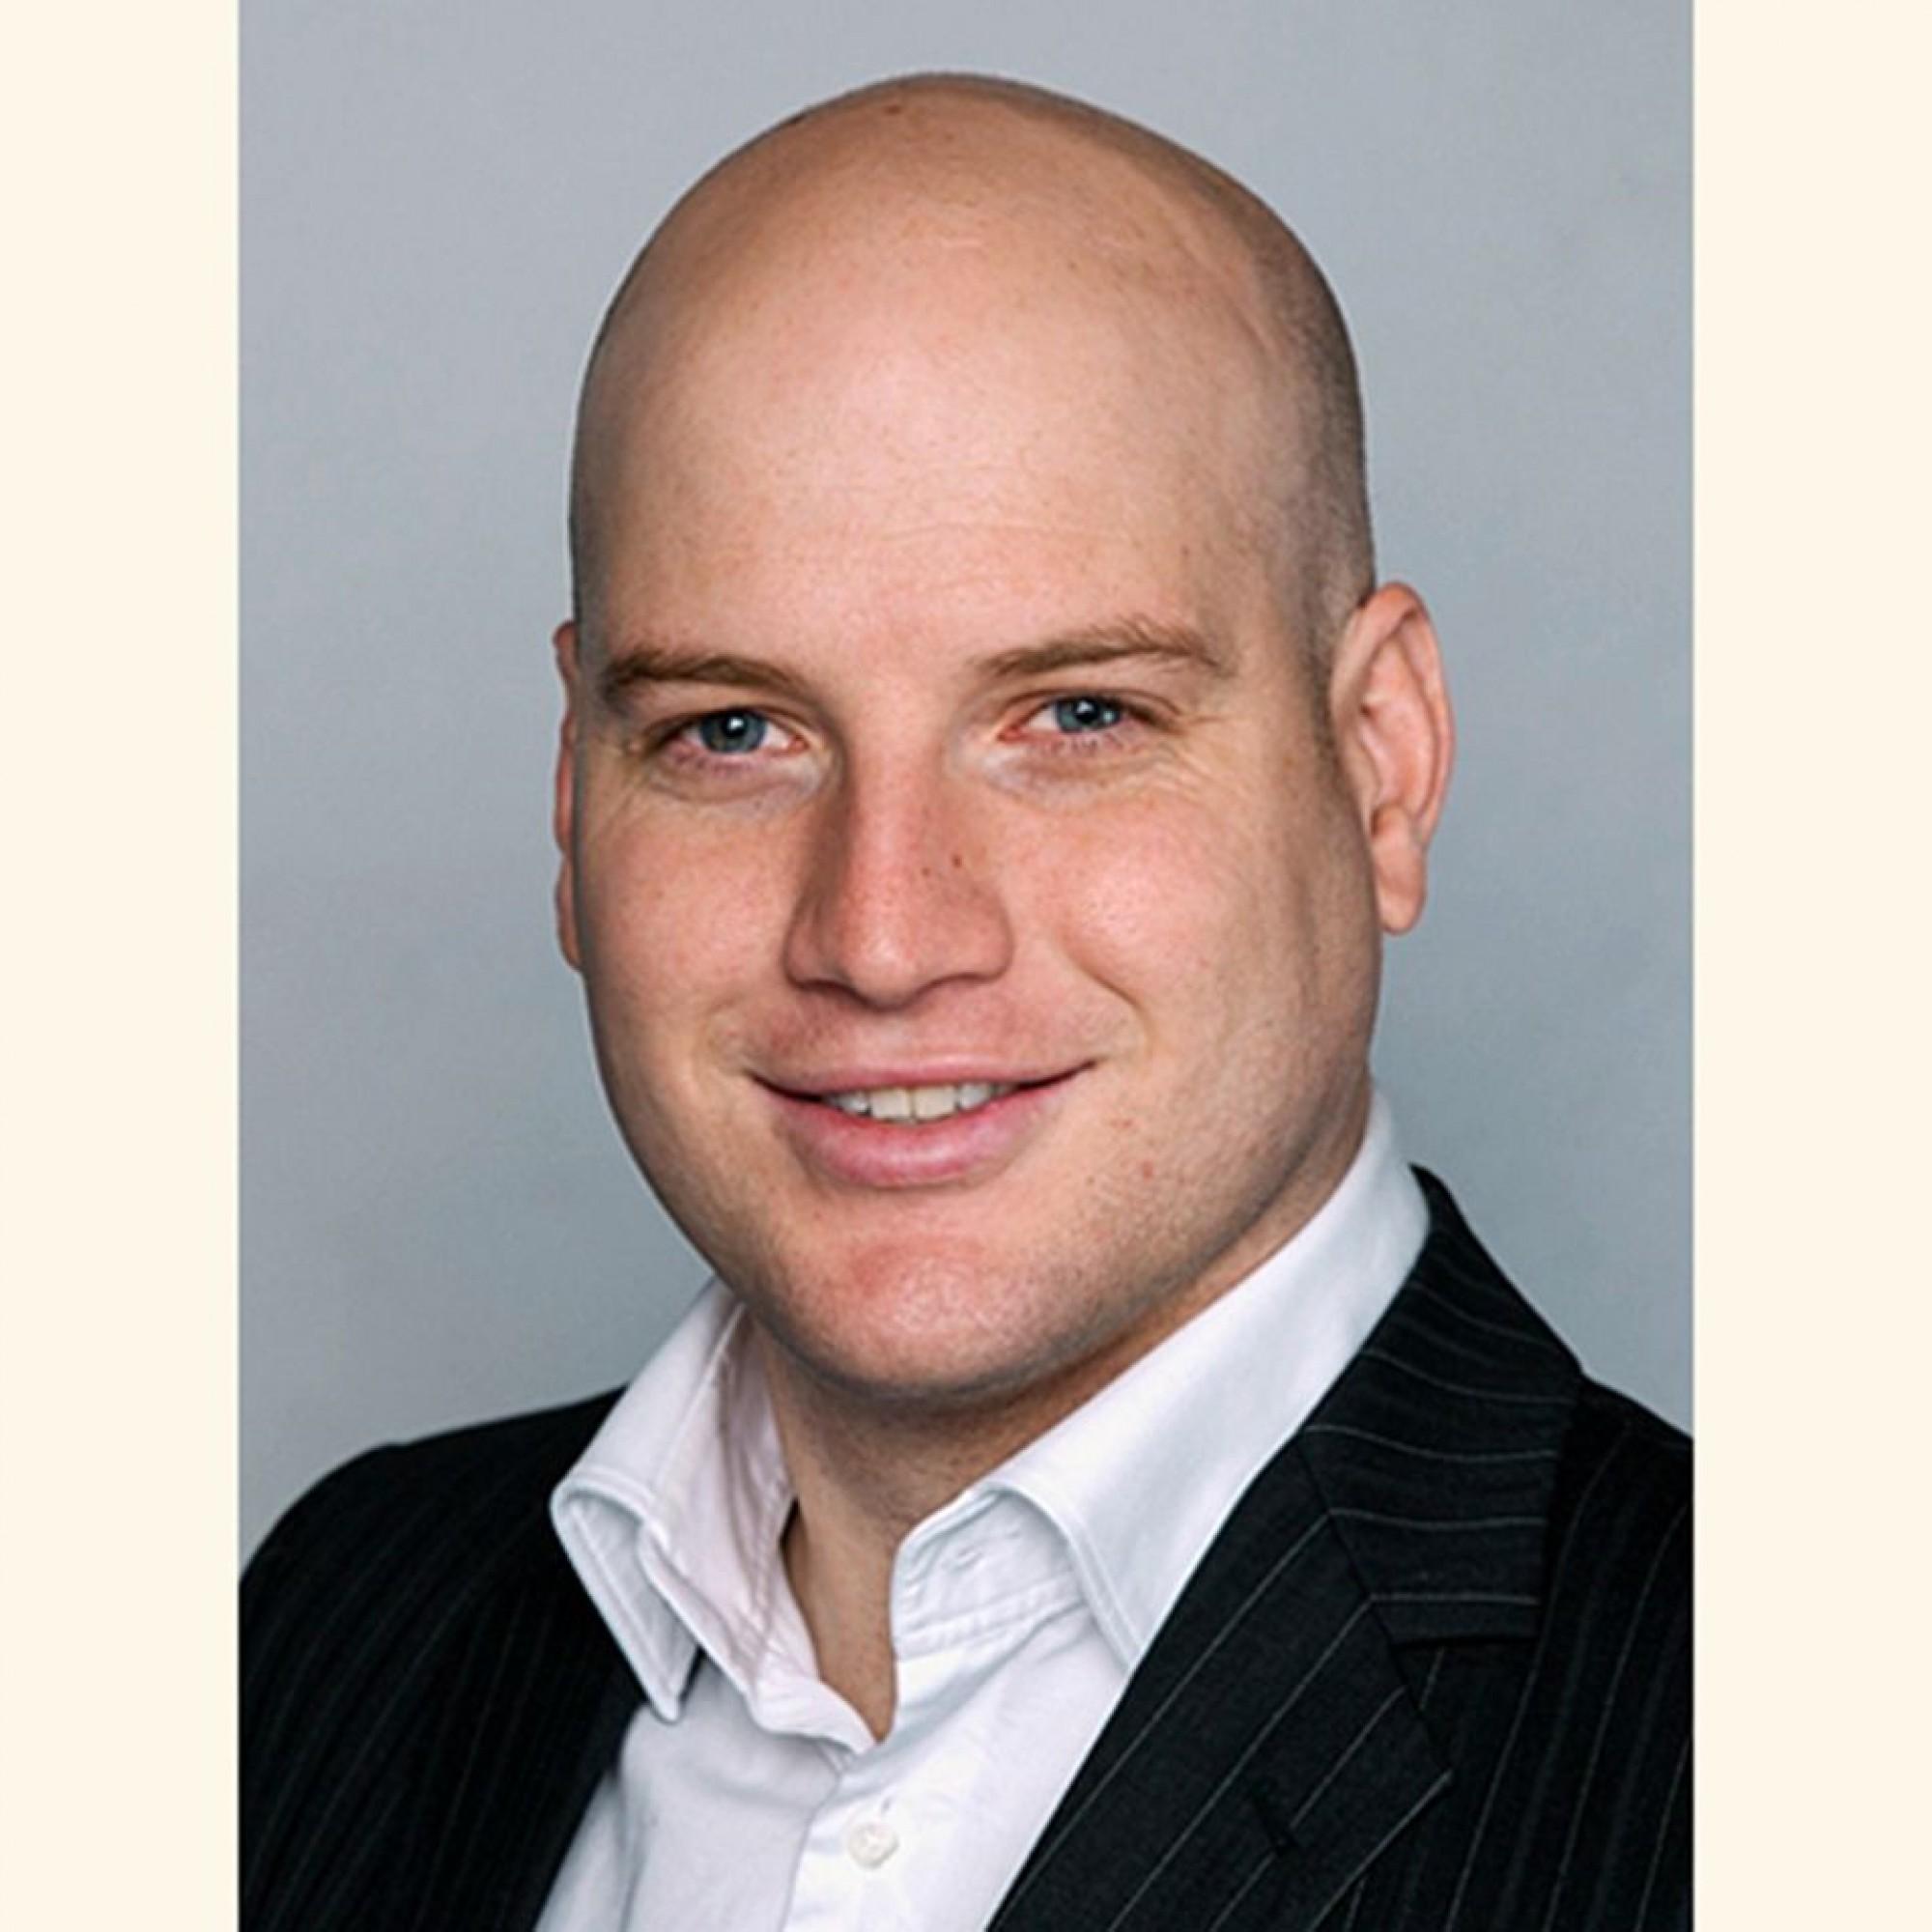 Philipp Groth, Teamleiter Sanierung, Implenia